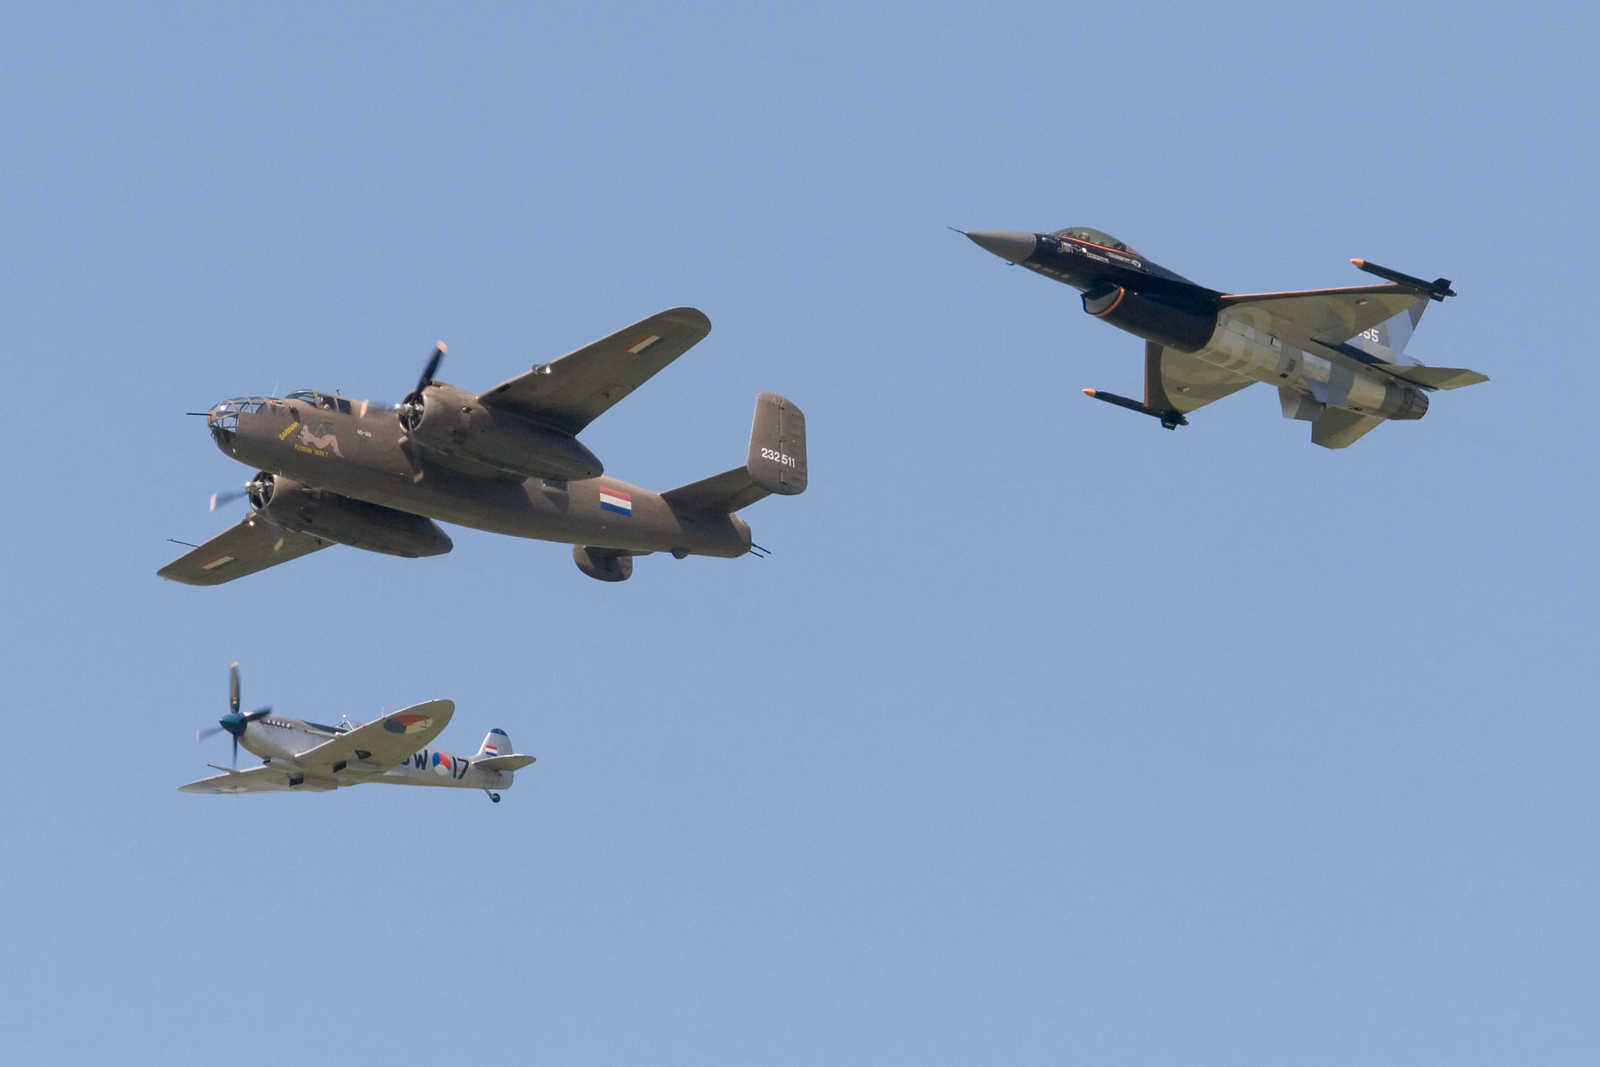 Heritage flight. Spitfire, B-25 Mitchell en F-16 demo. Royal Netherlands Air Force.